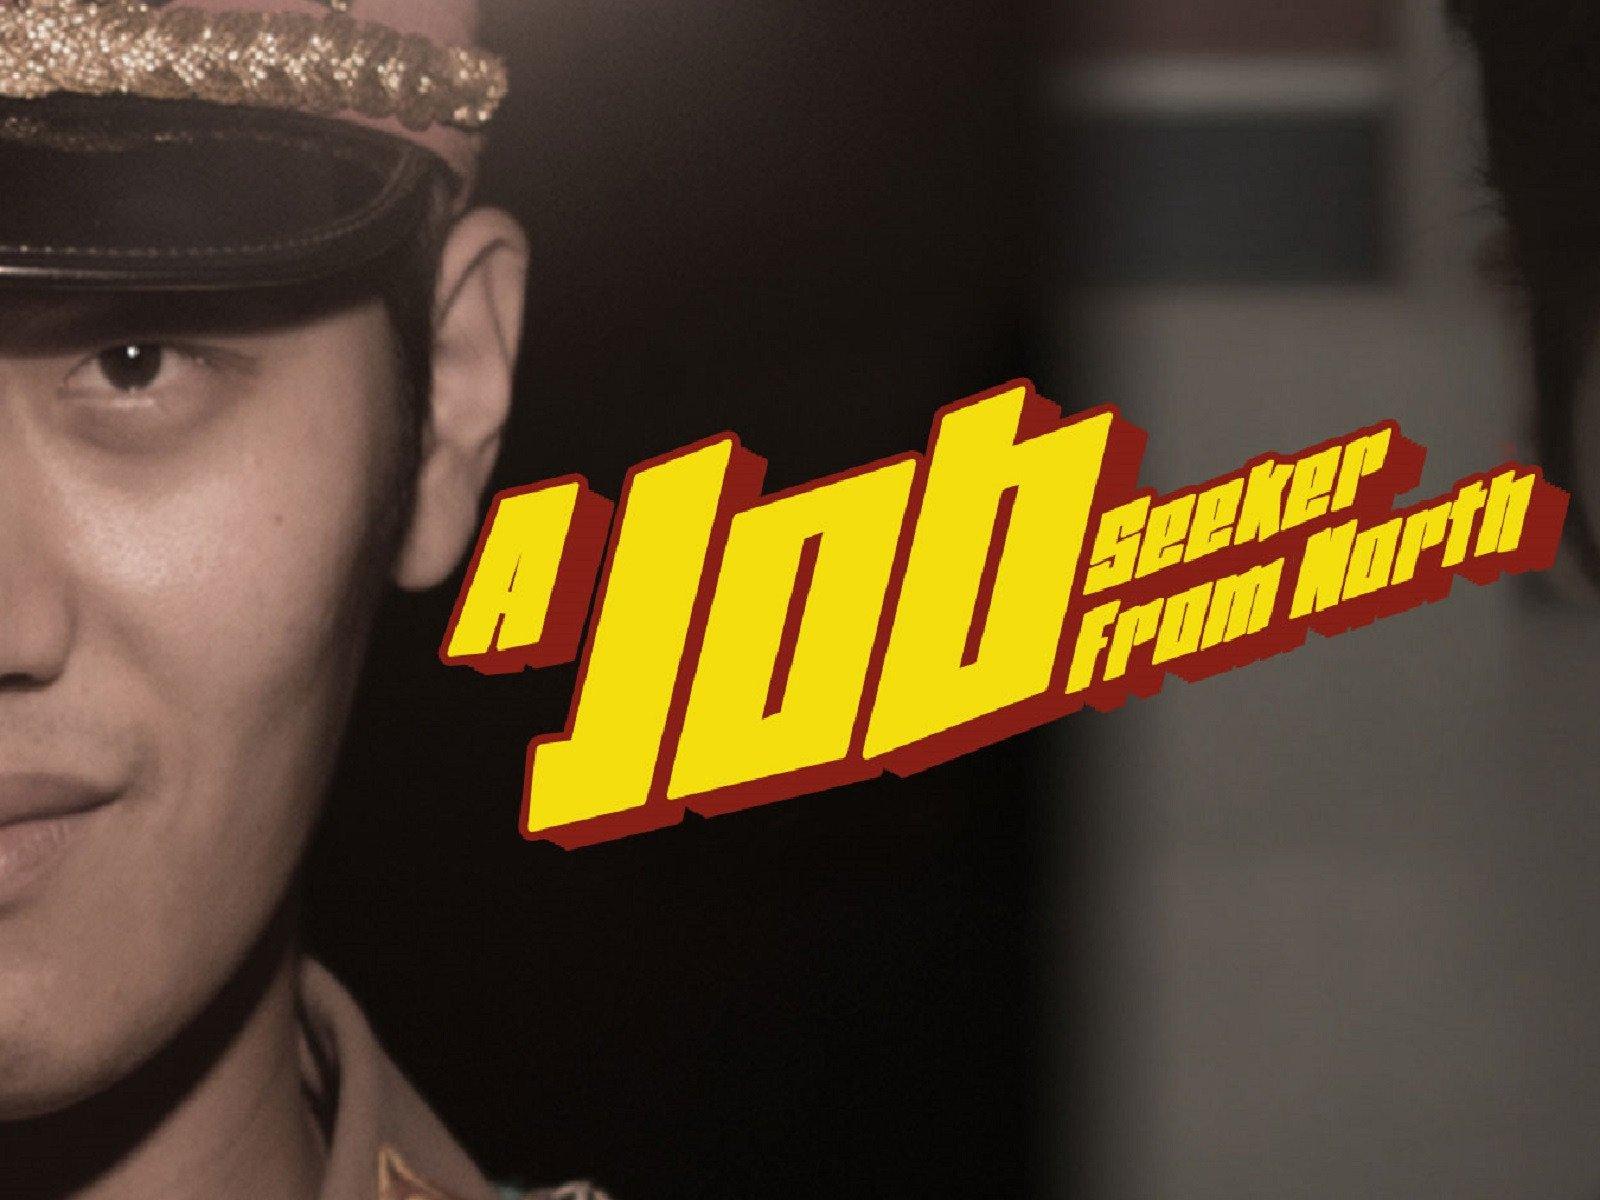 A Job Seeker from North Korea - Season 1